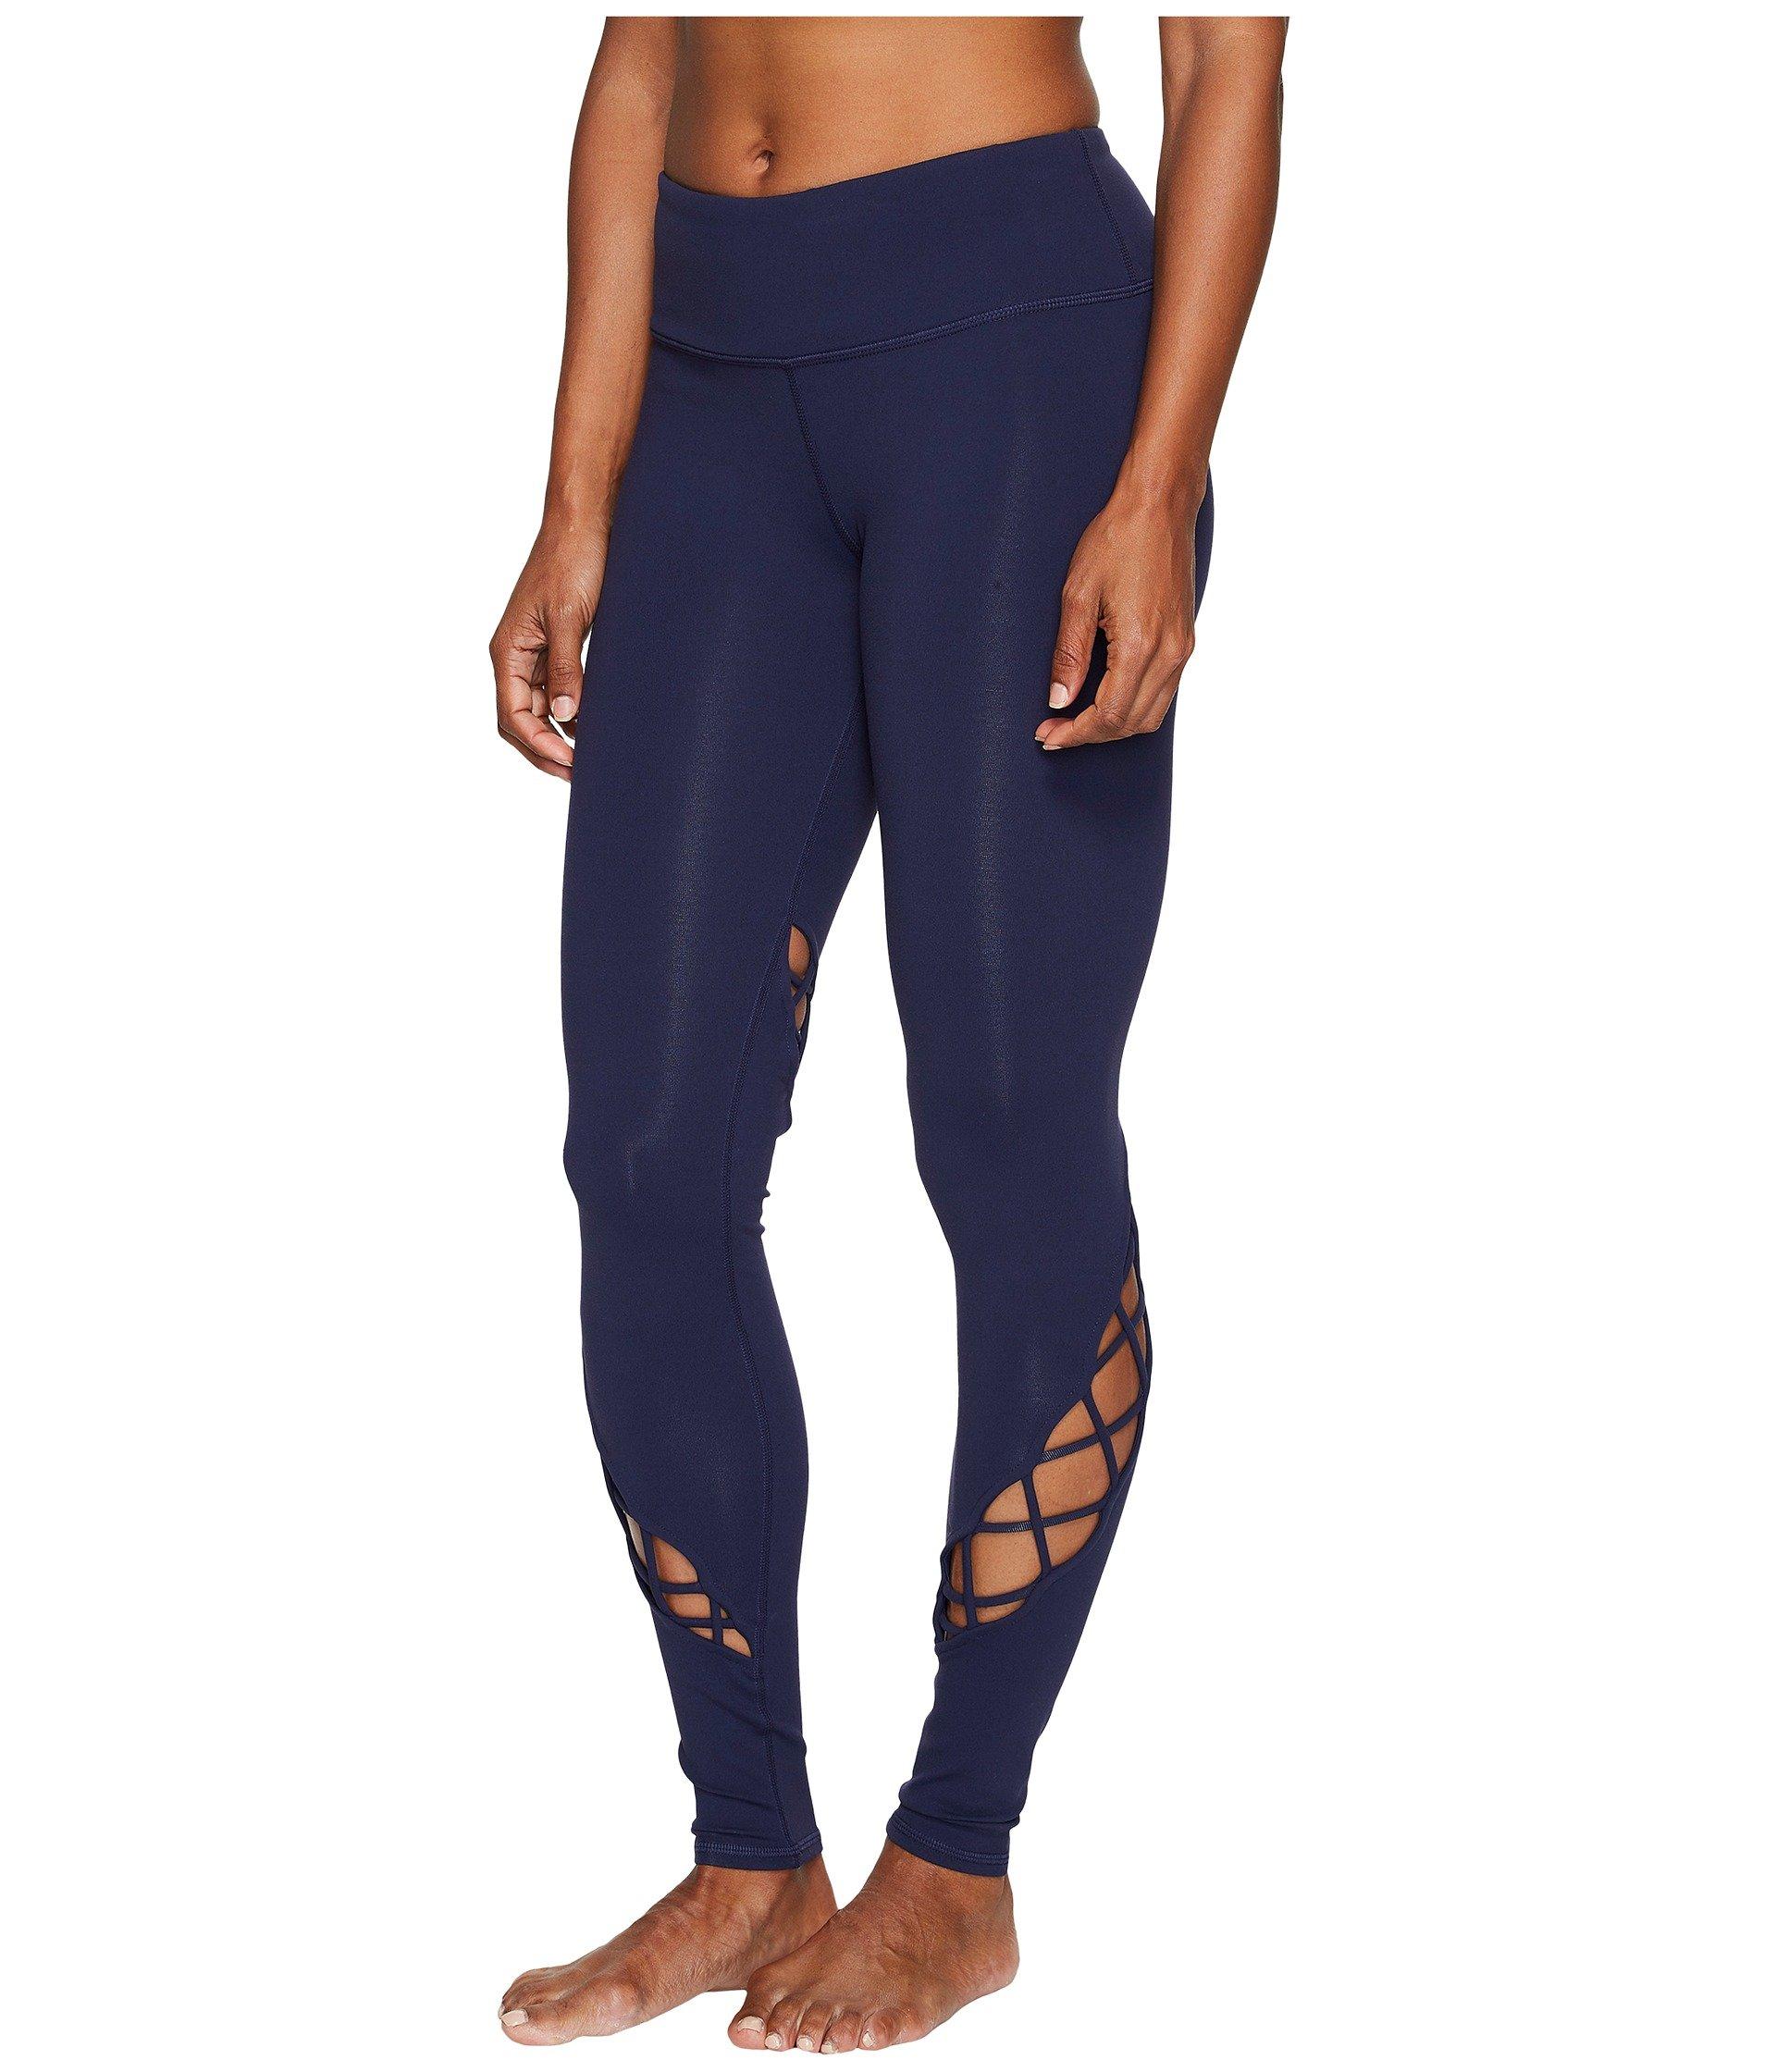 Alo Yoga Women's Entwine Legging, Rich Navy XX-Small